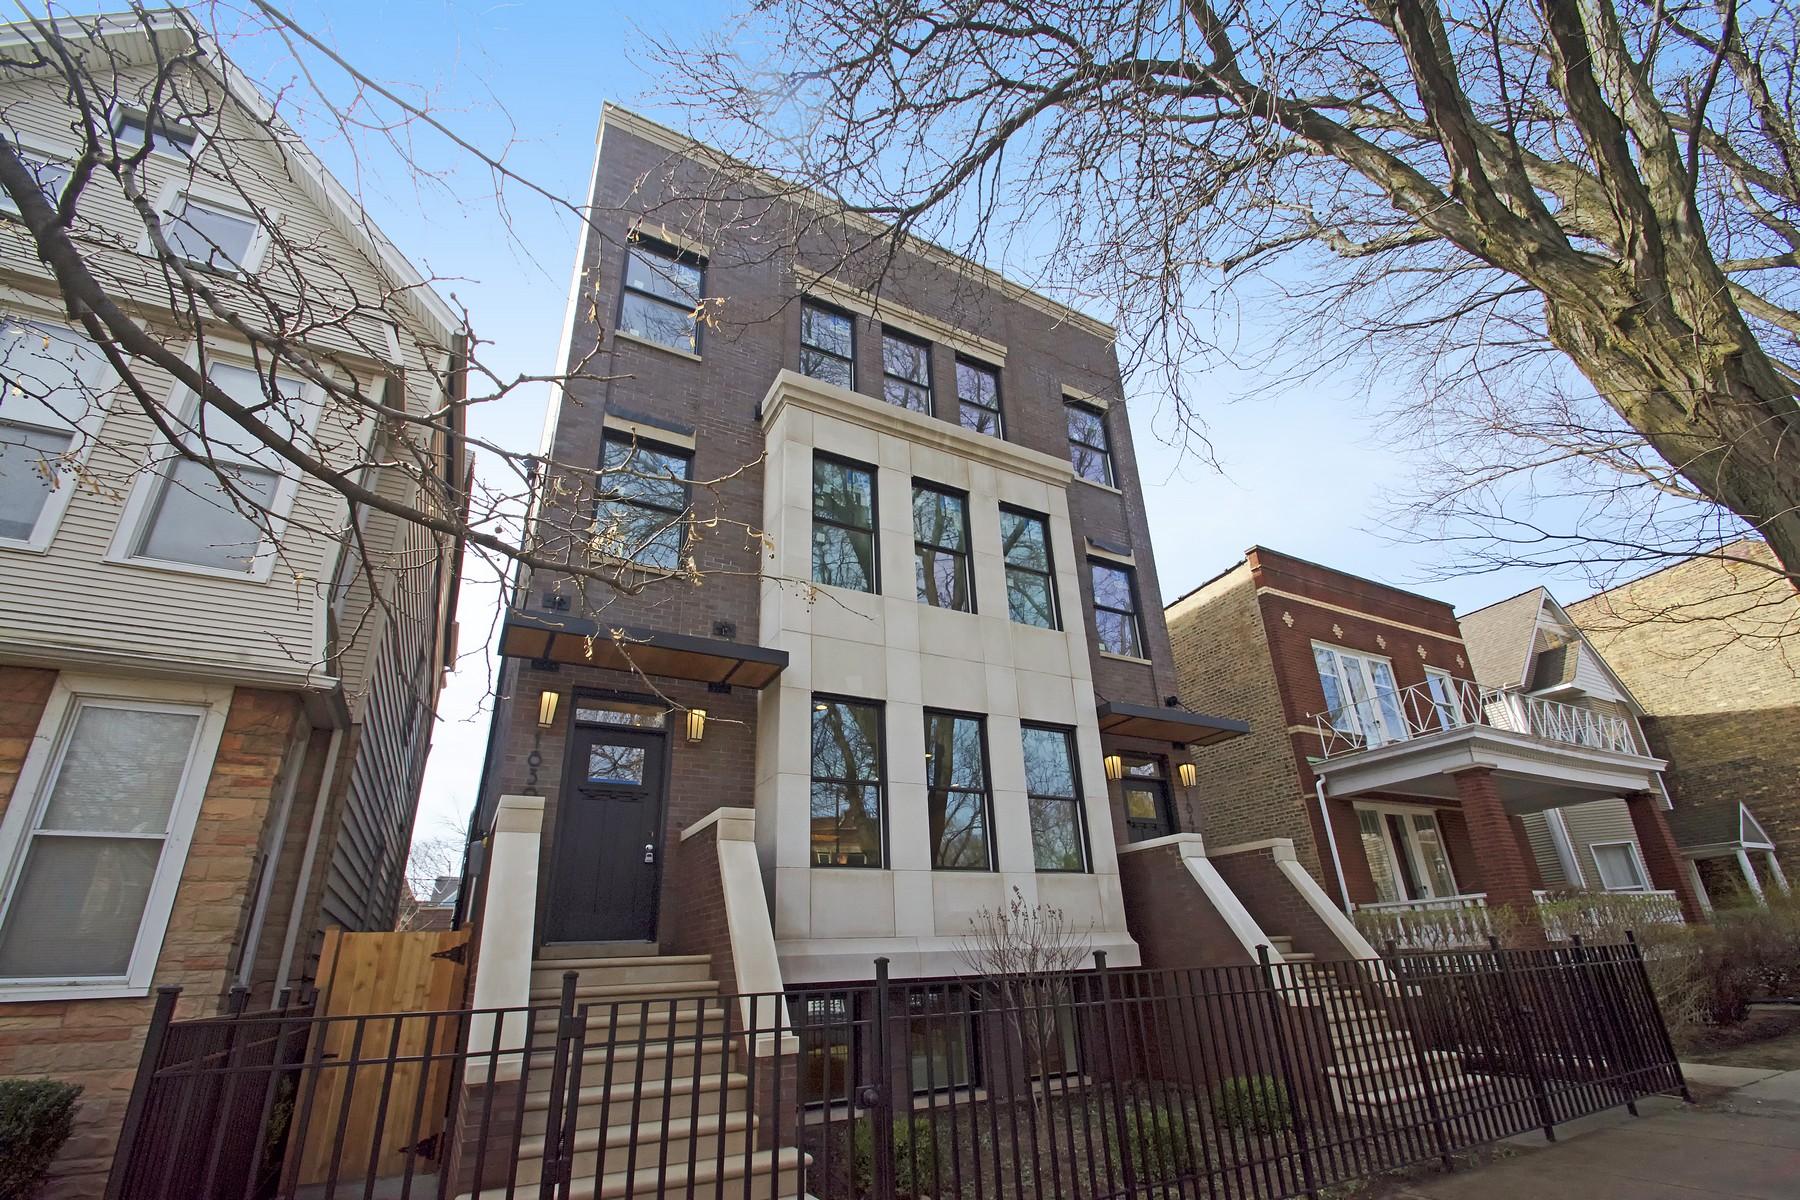 獨棟家庭住宅 為 出售 在 New Construction Palatial Home 1839 W Addison Street Chicago, 伊利諾斯州, 60613 美國